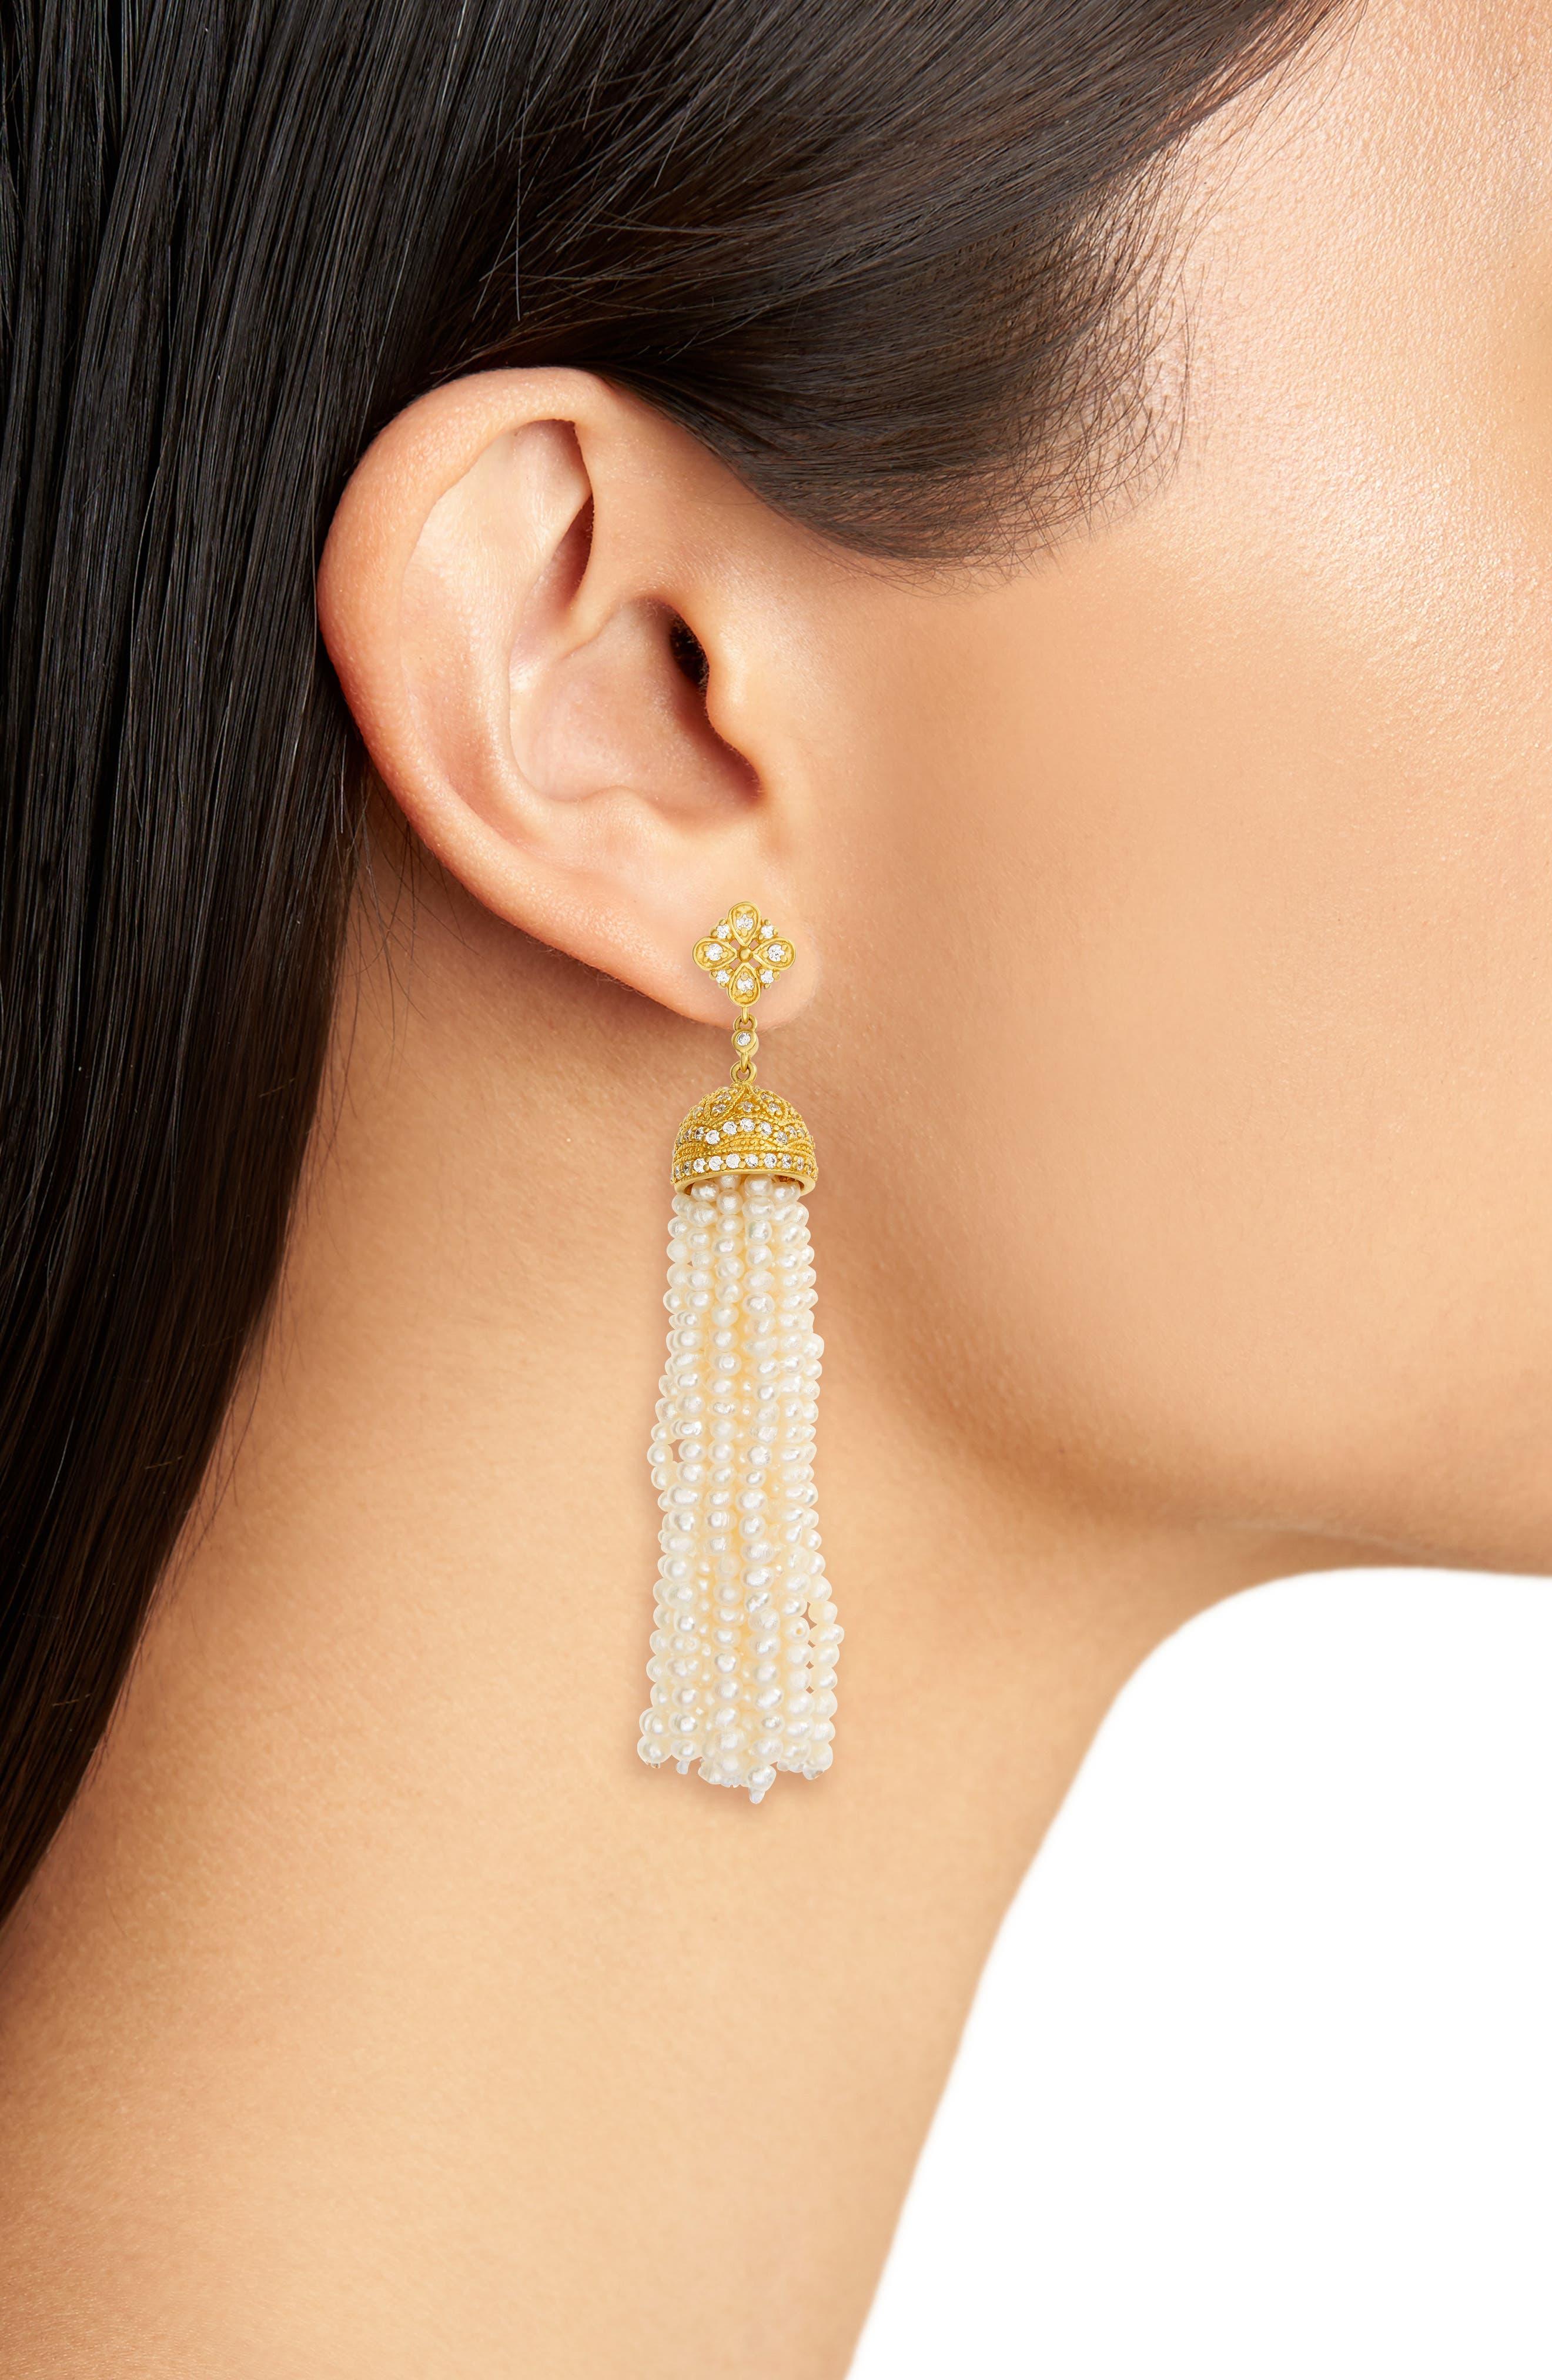 Audrey Waterfall Tassel Pearl Earrings,                             Alternate thumbnail 2, color,                             Gold/ Pearl